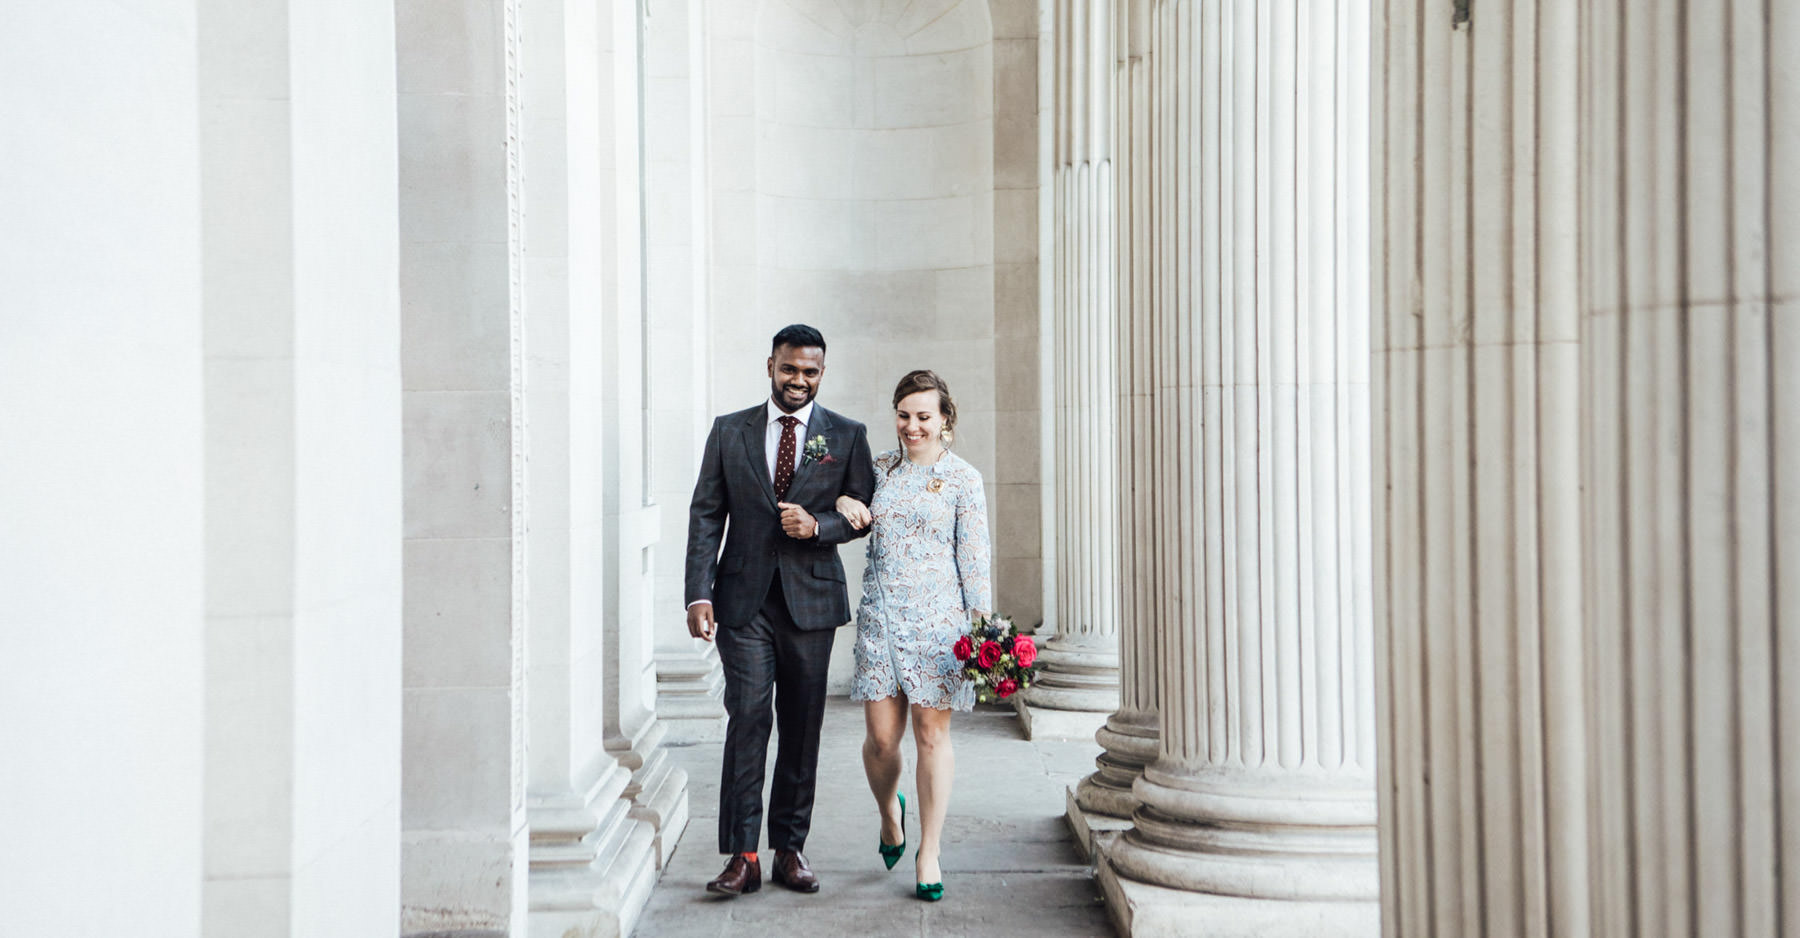 Marylebone Westminster room wedding photography | Town Hall wedding